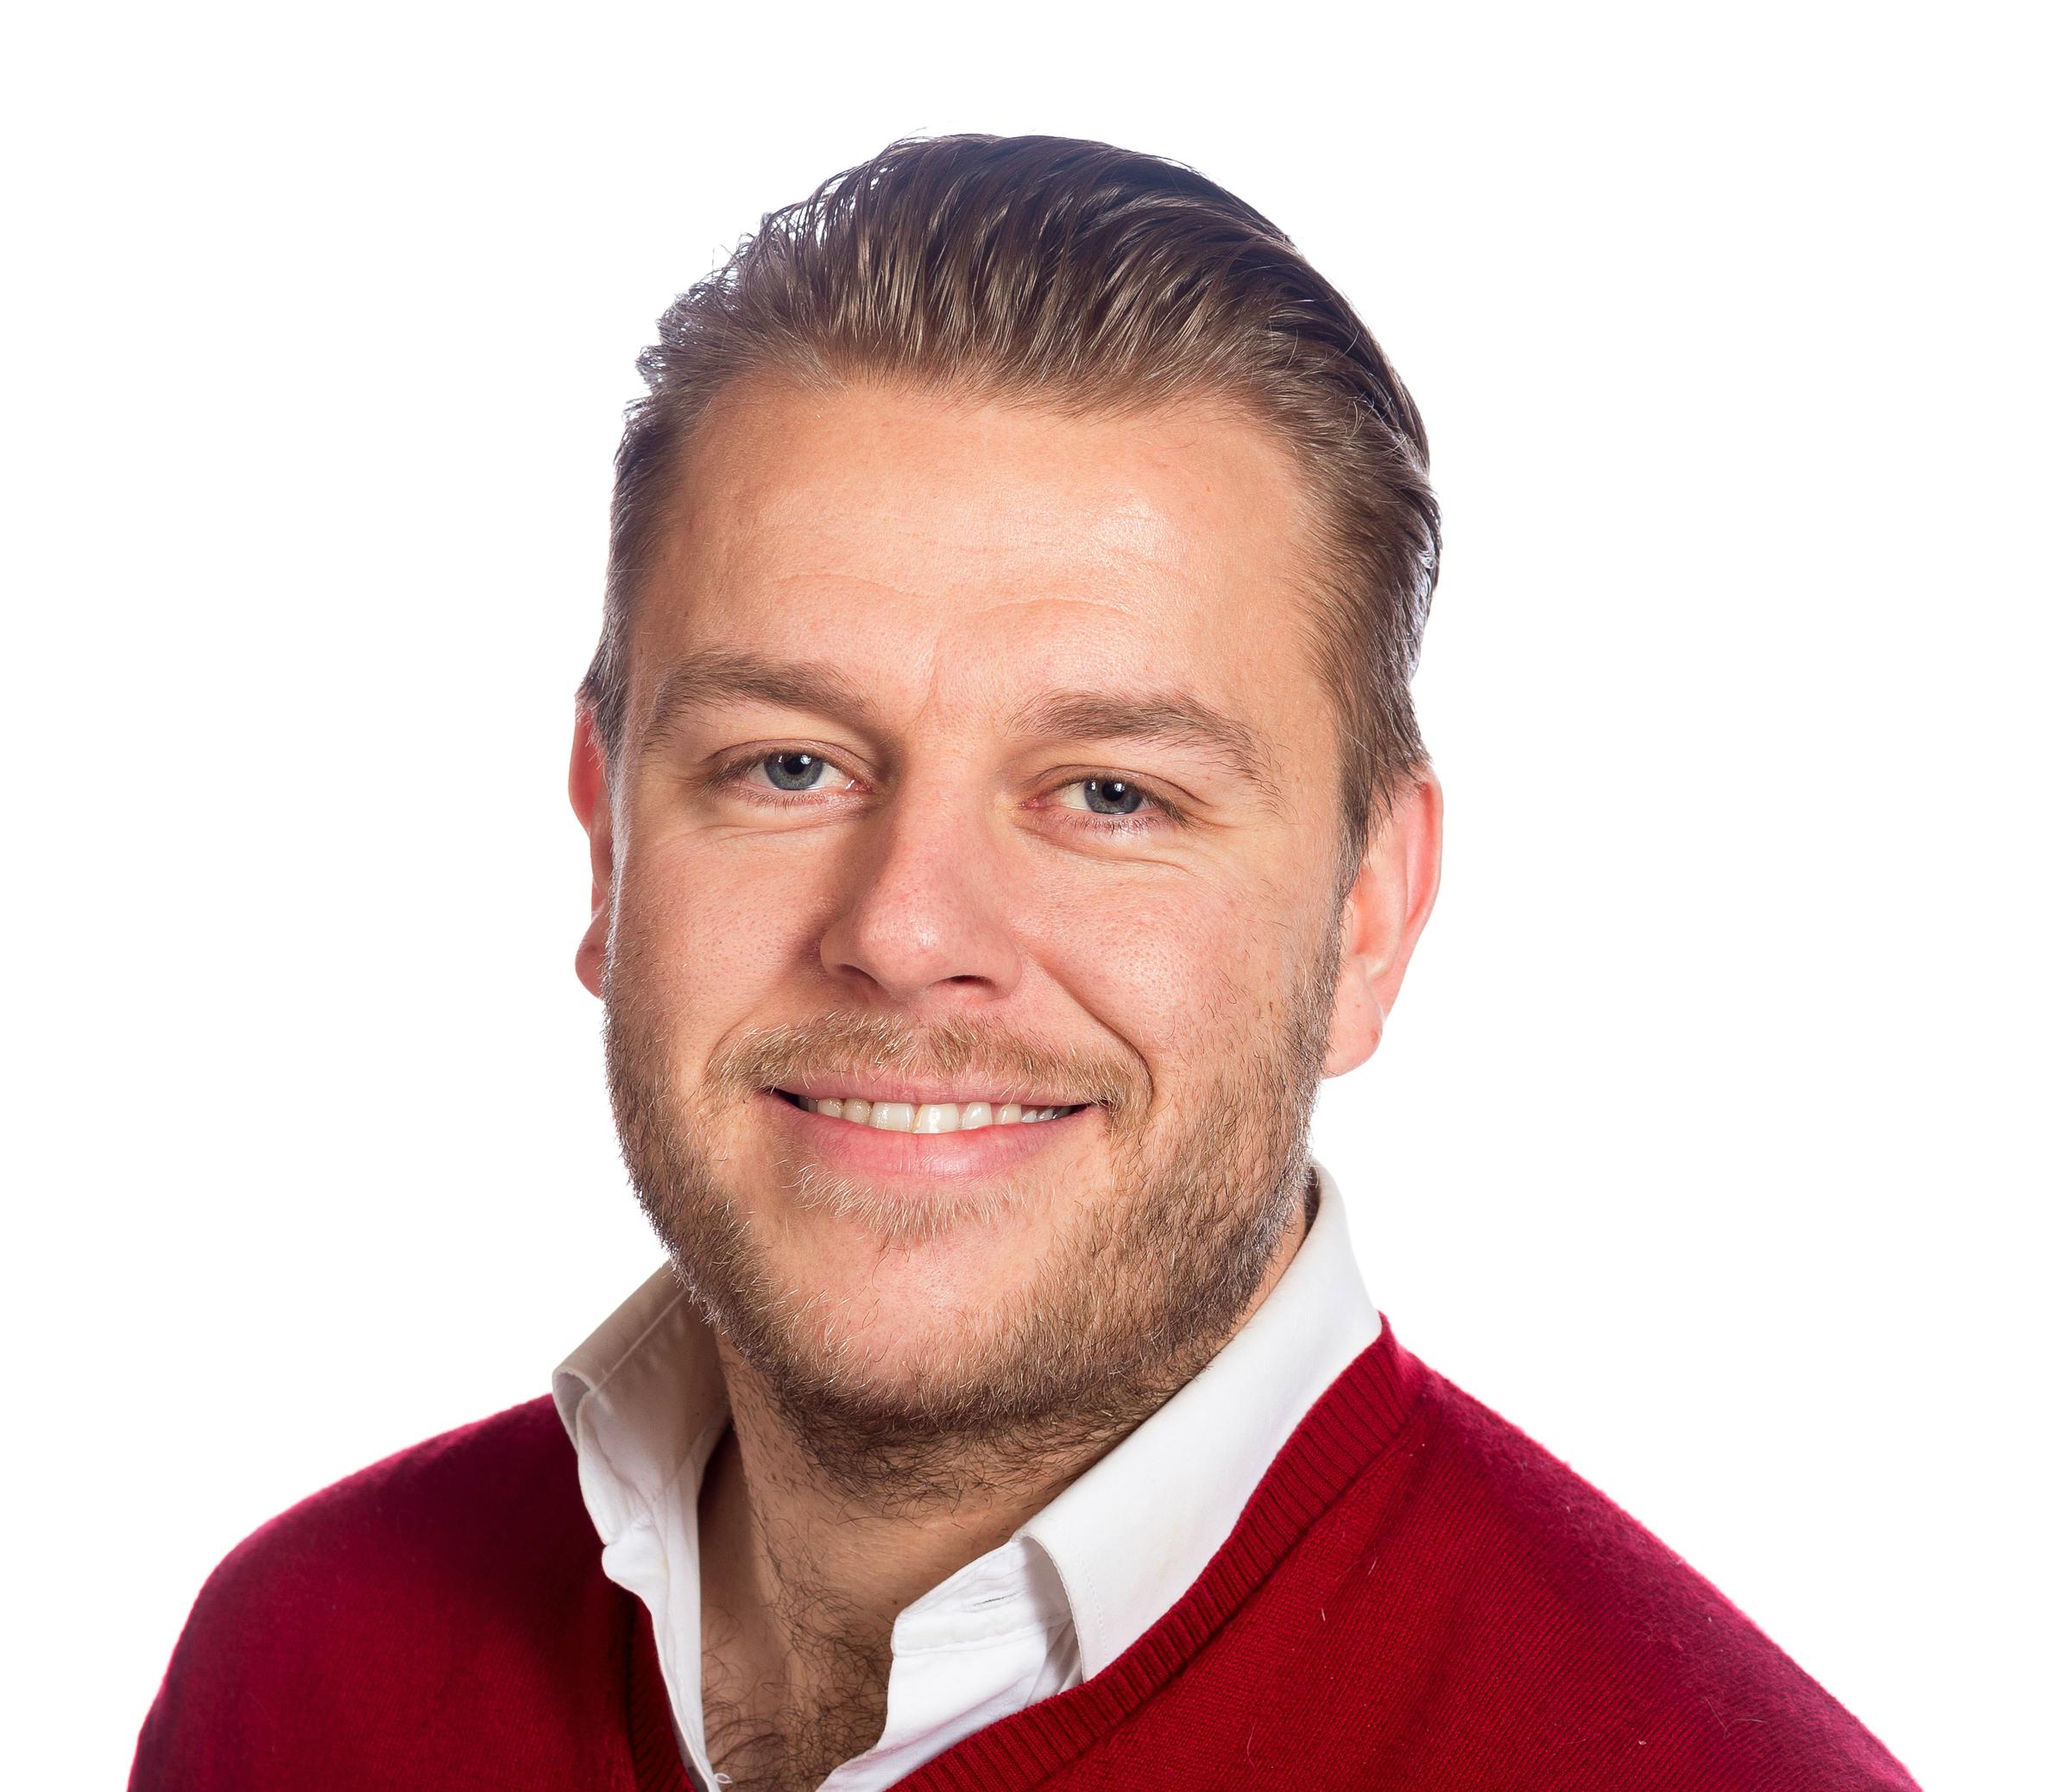 Daniel Upson